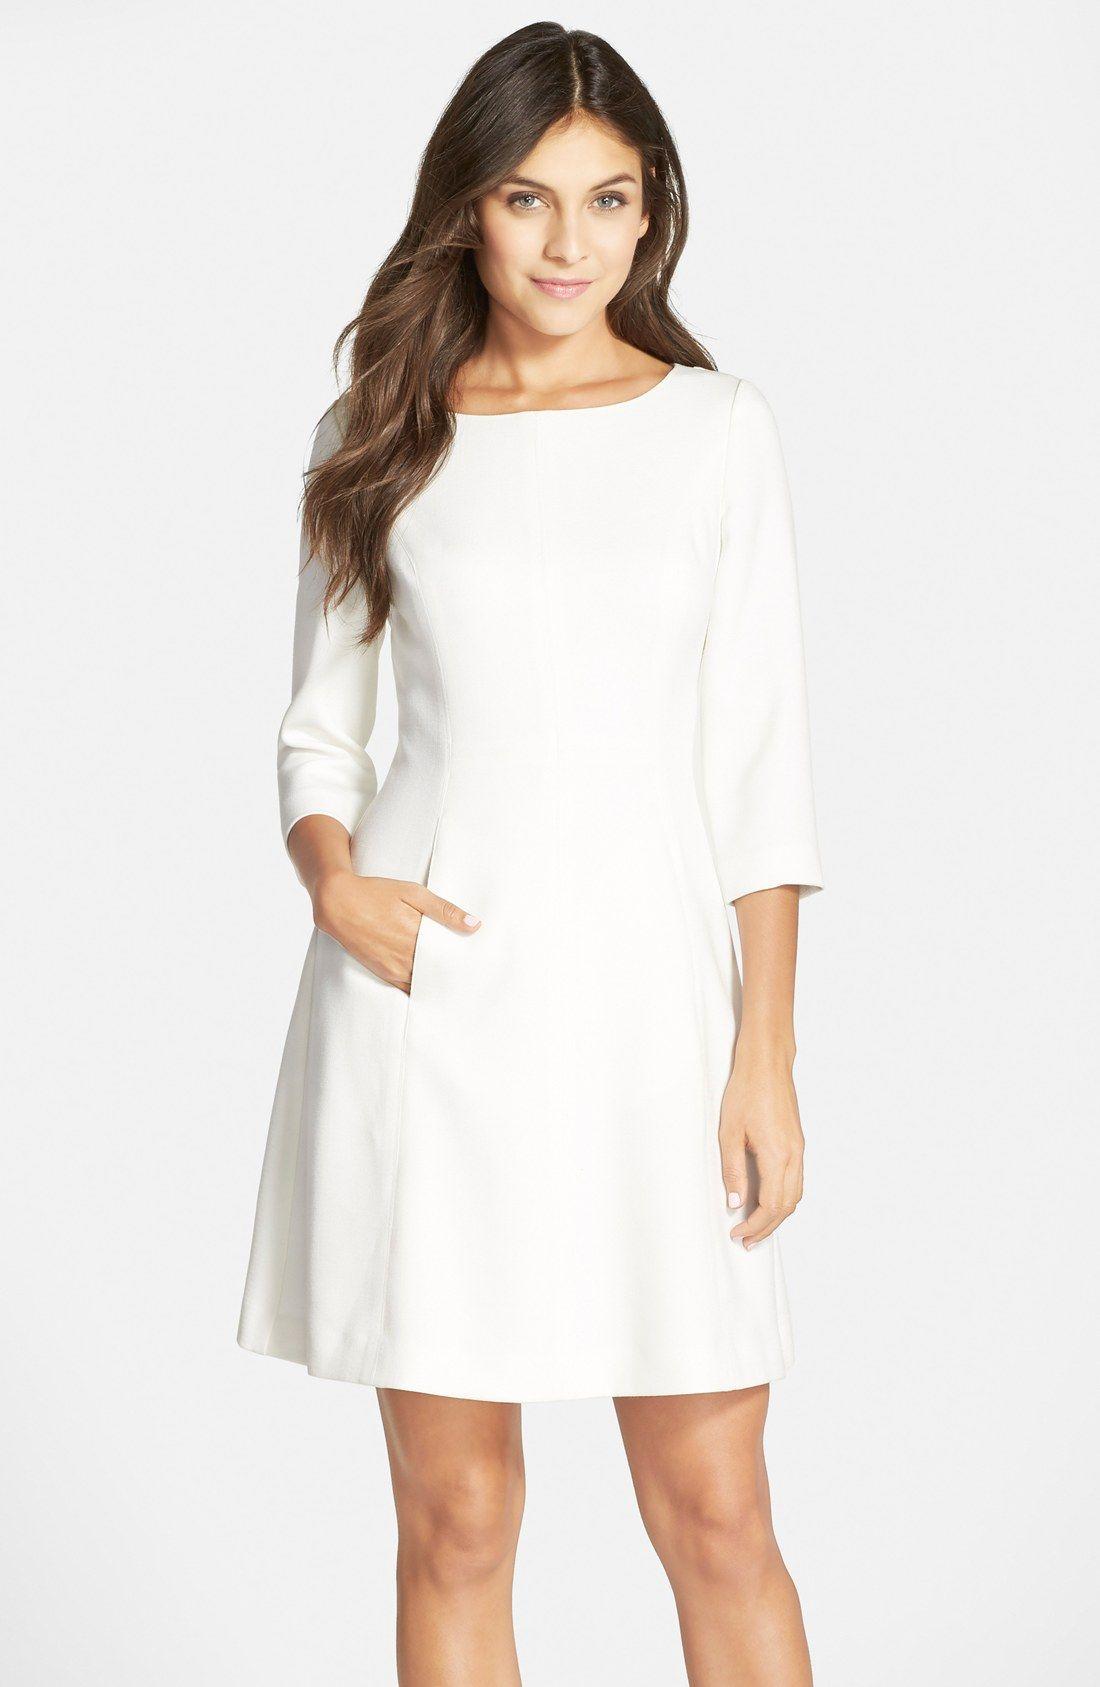 Vince Camuto Crepe A Line Dress Regular Petite Nordstrom Dresses A Line Dress White Dresses For Women [ 1687 x 1100 Pixel ]